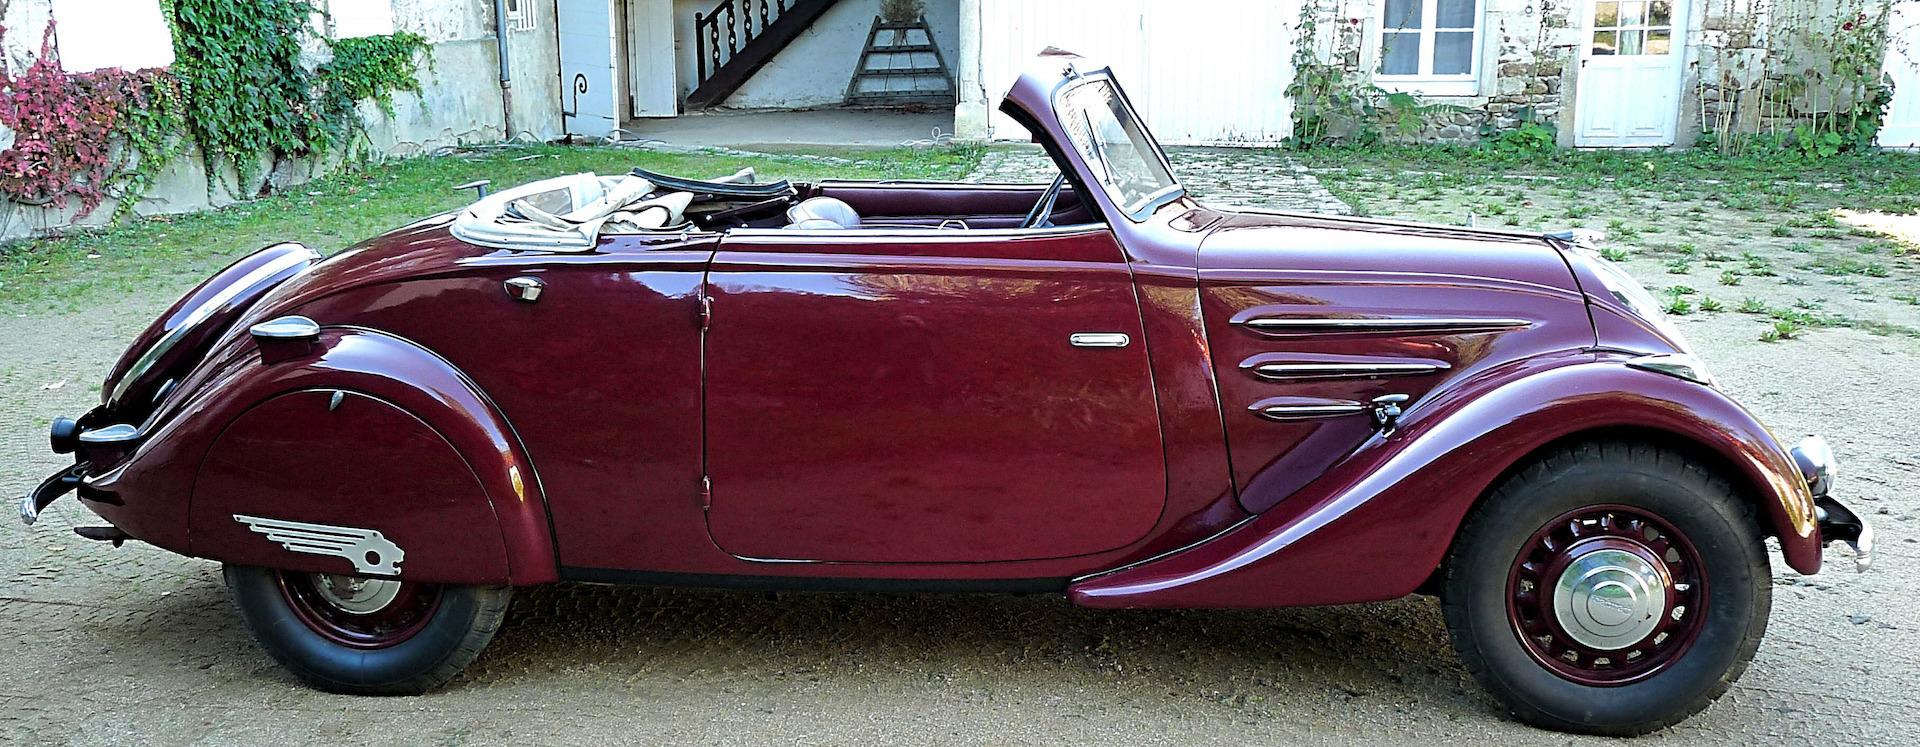 302 Peugeot cabriolet :3 profil